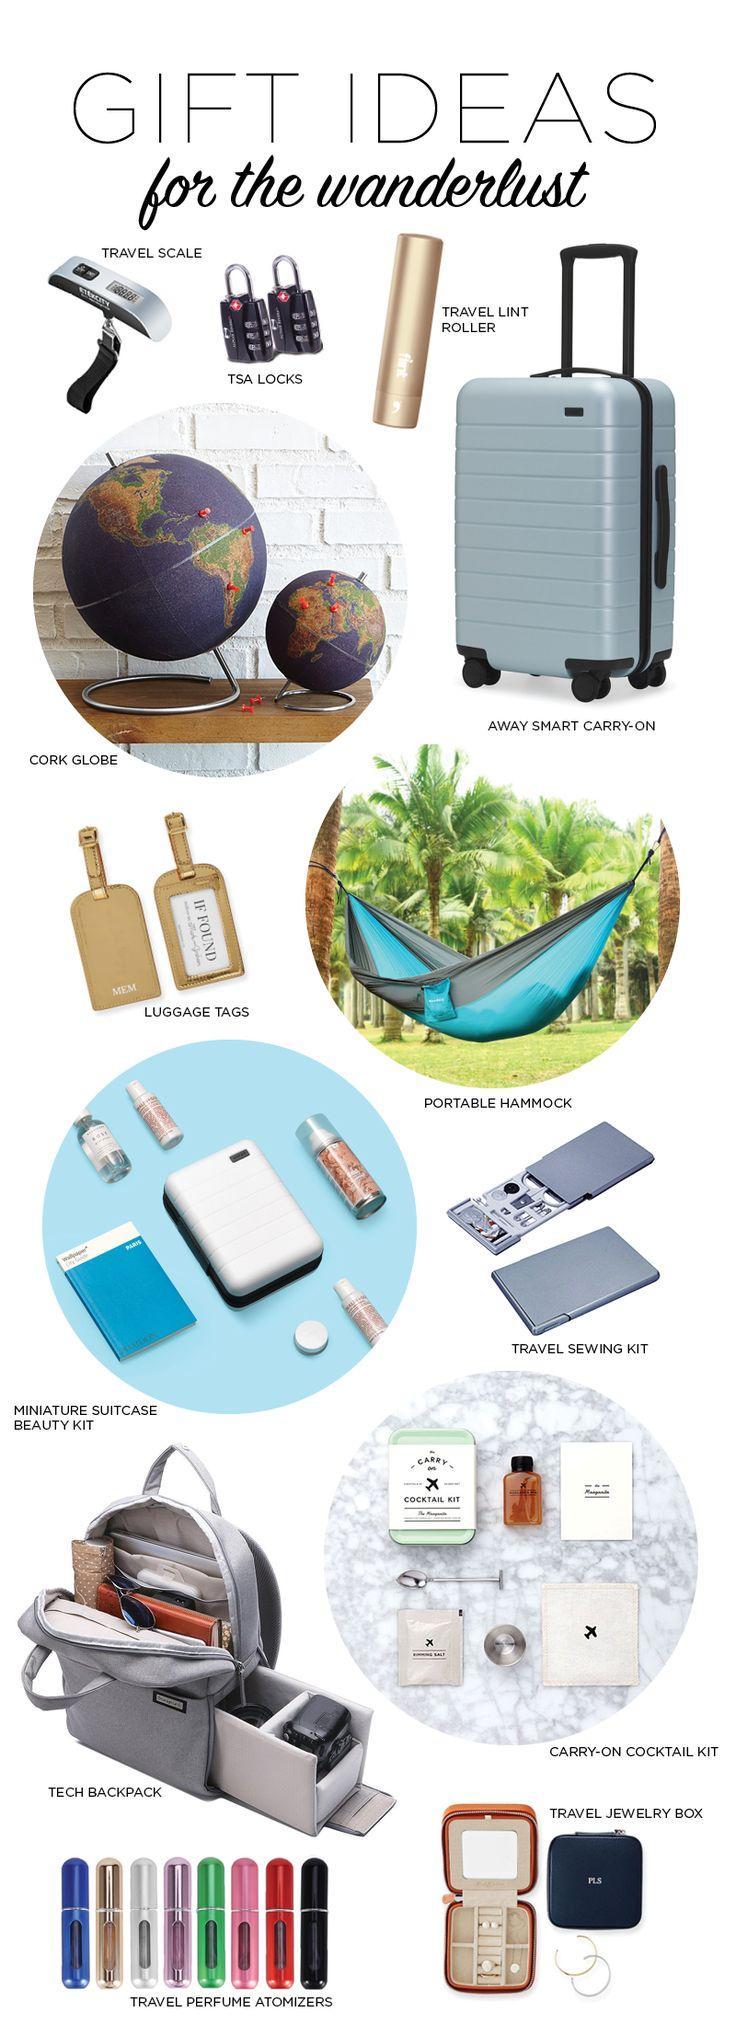 Wedding - Gift Ideas For The Wanderlust